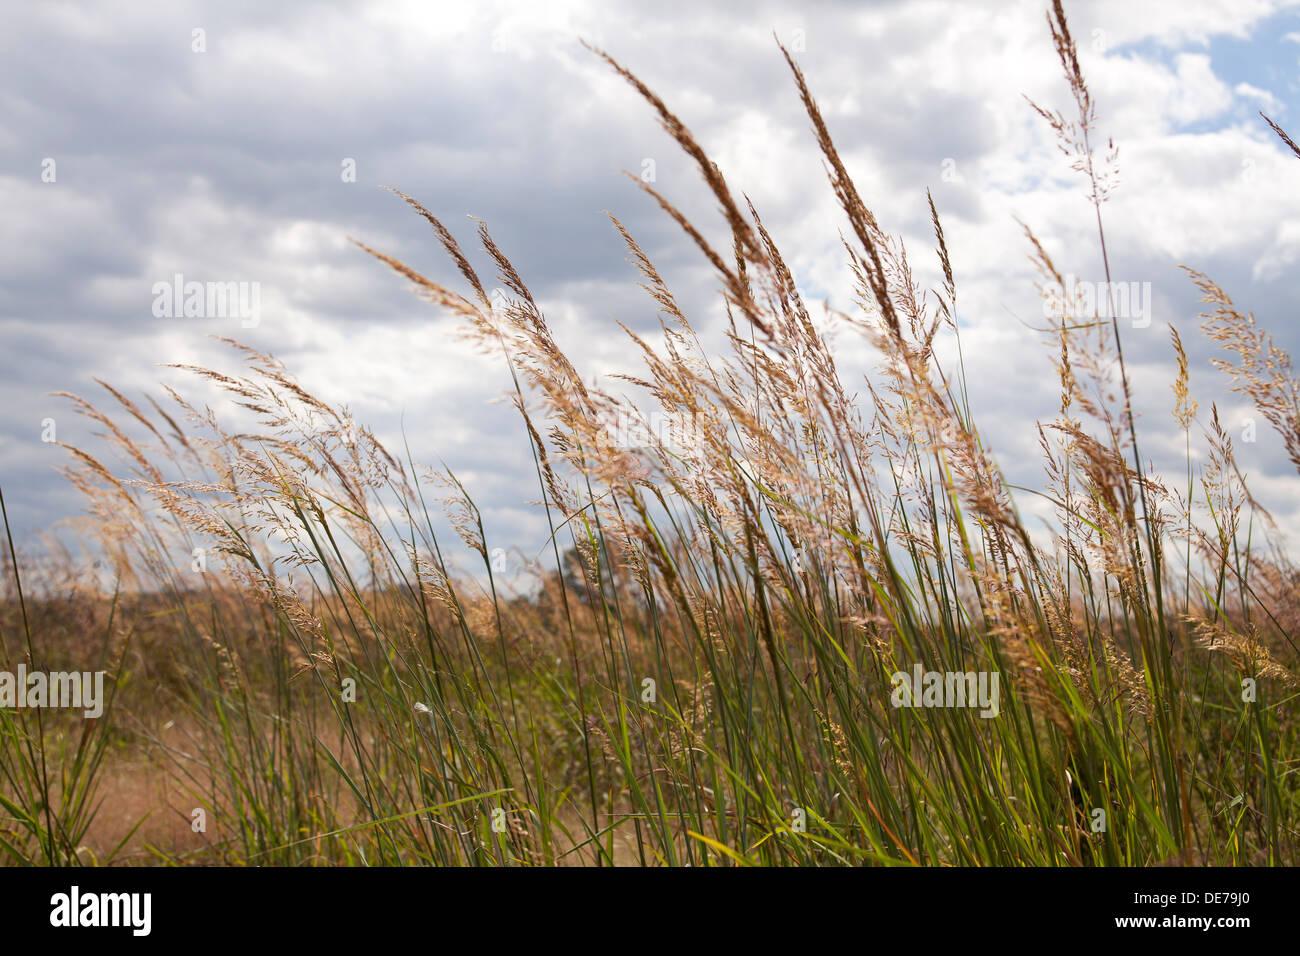 Dried wheat grass field - Pennsylvania, USA - Stock Image